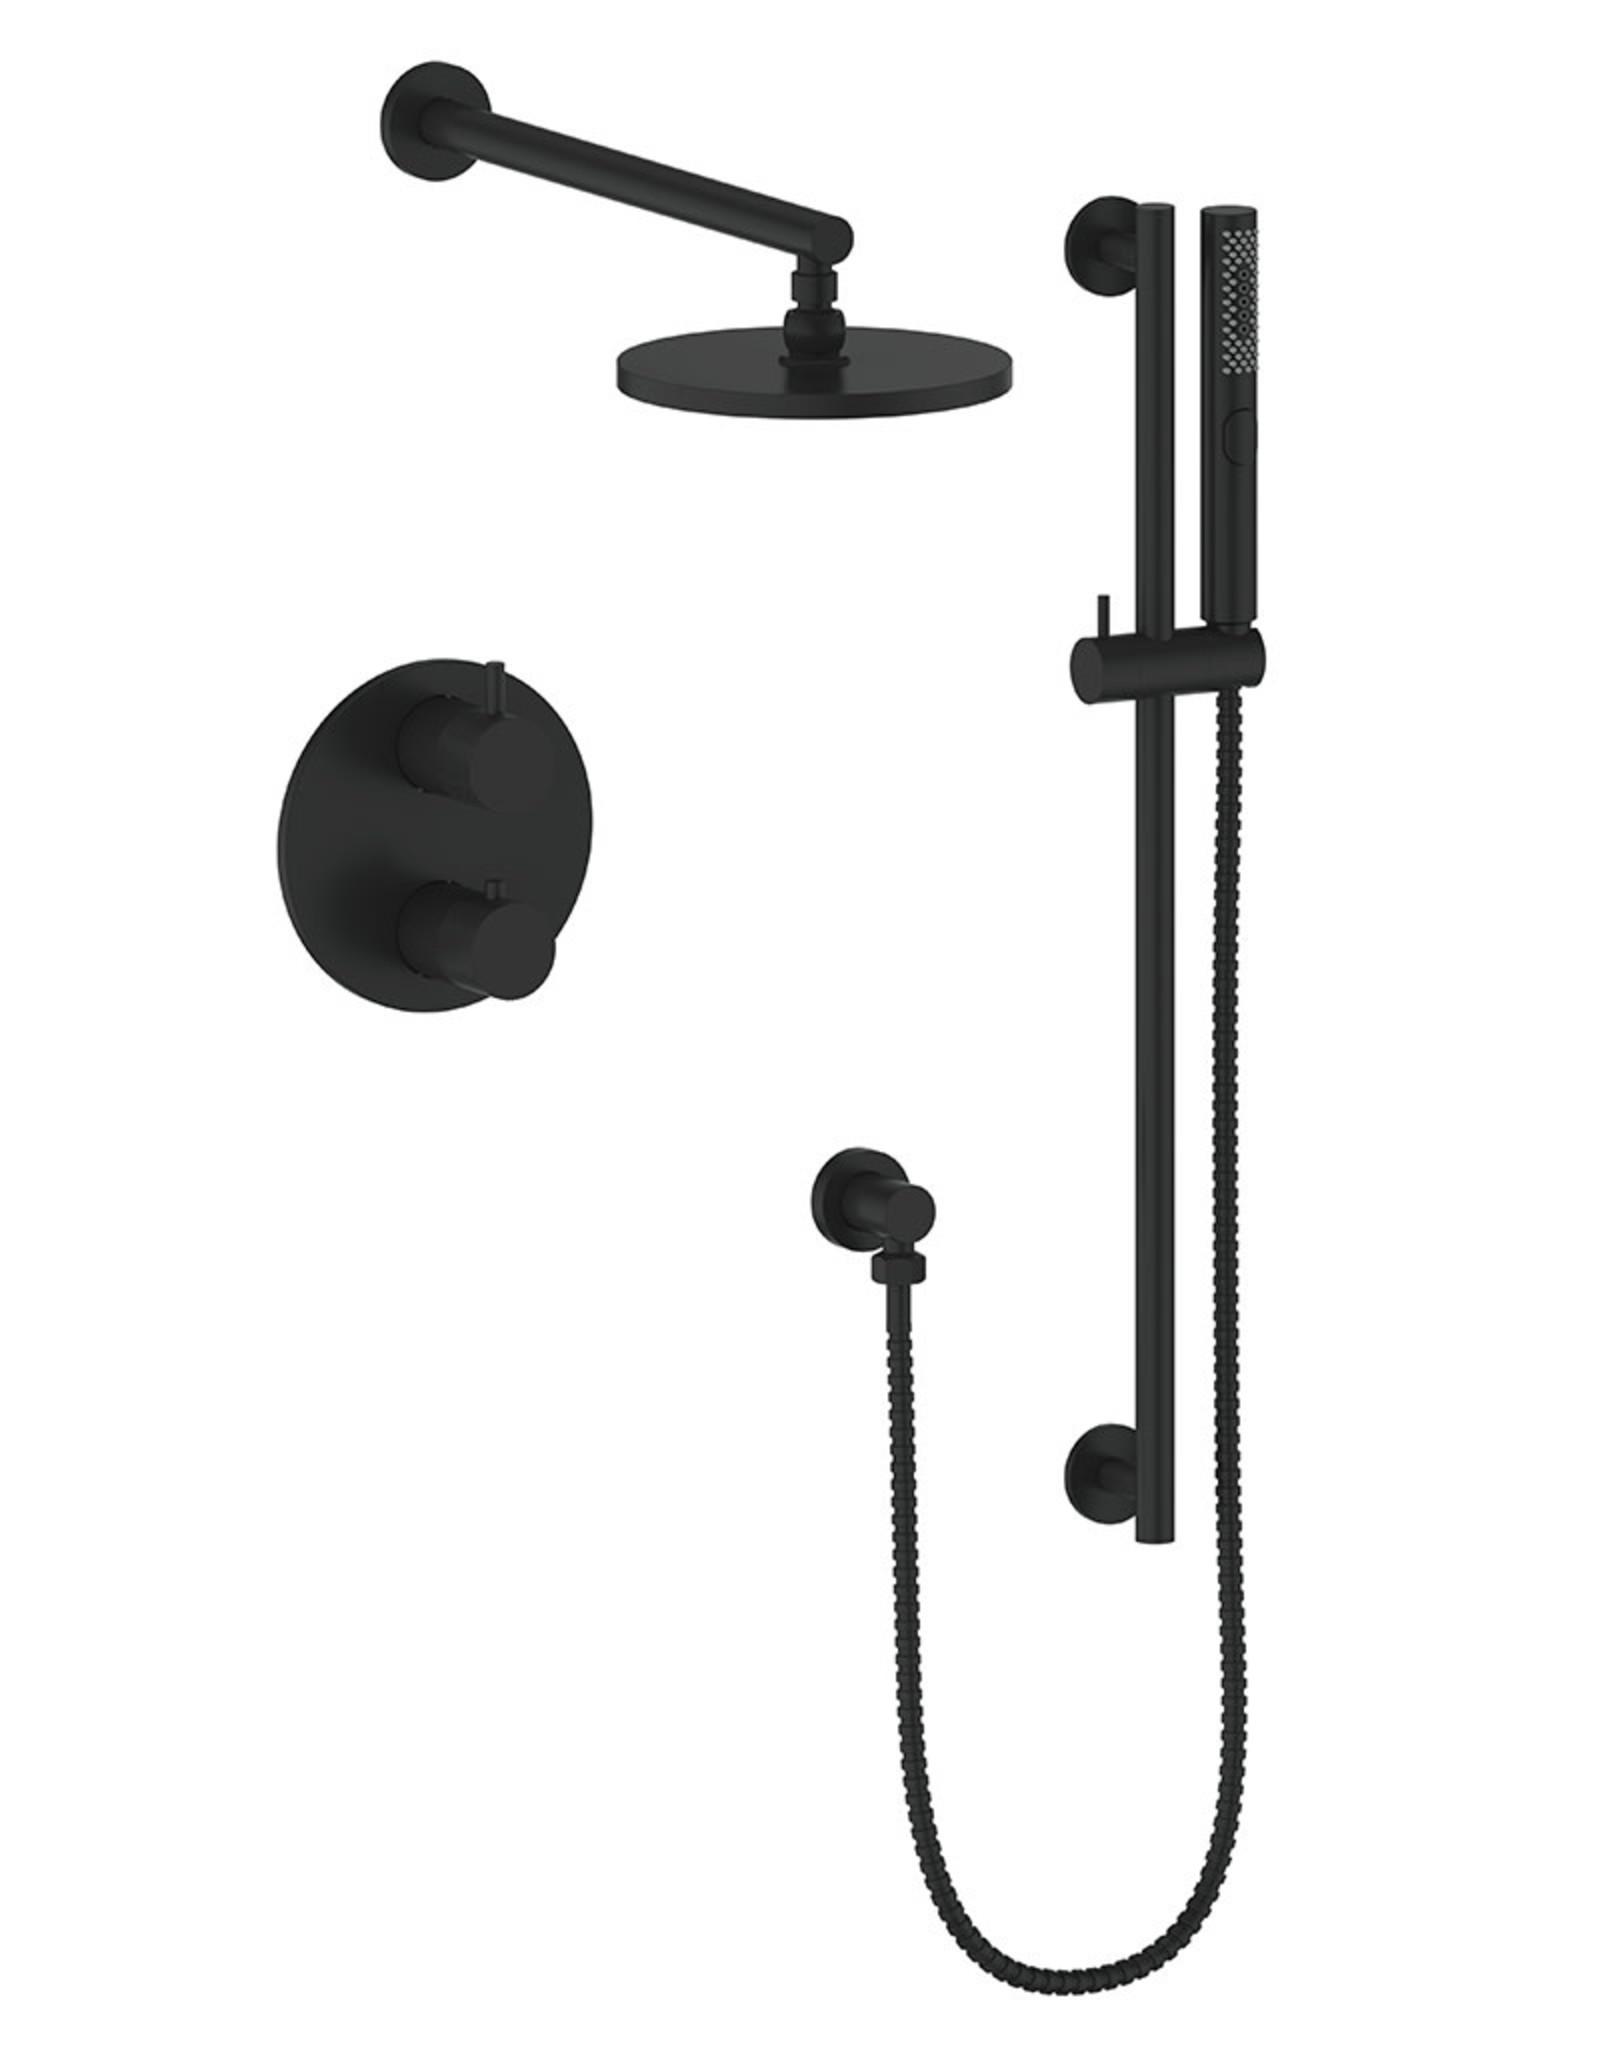 Vogt Drava 2-Way Thermostatic Shower System Handheld with Rainhead- Matte Black